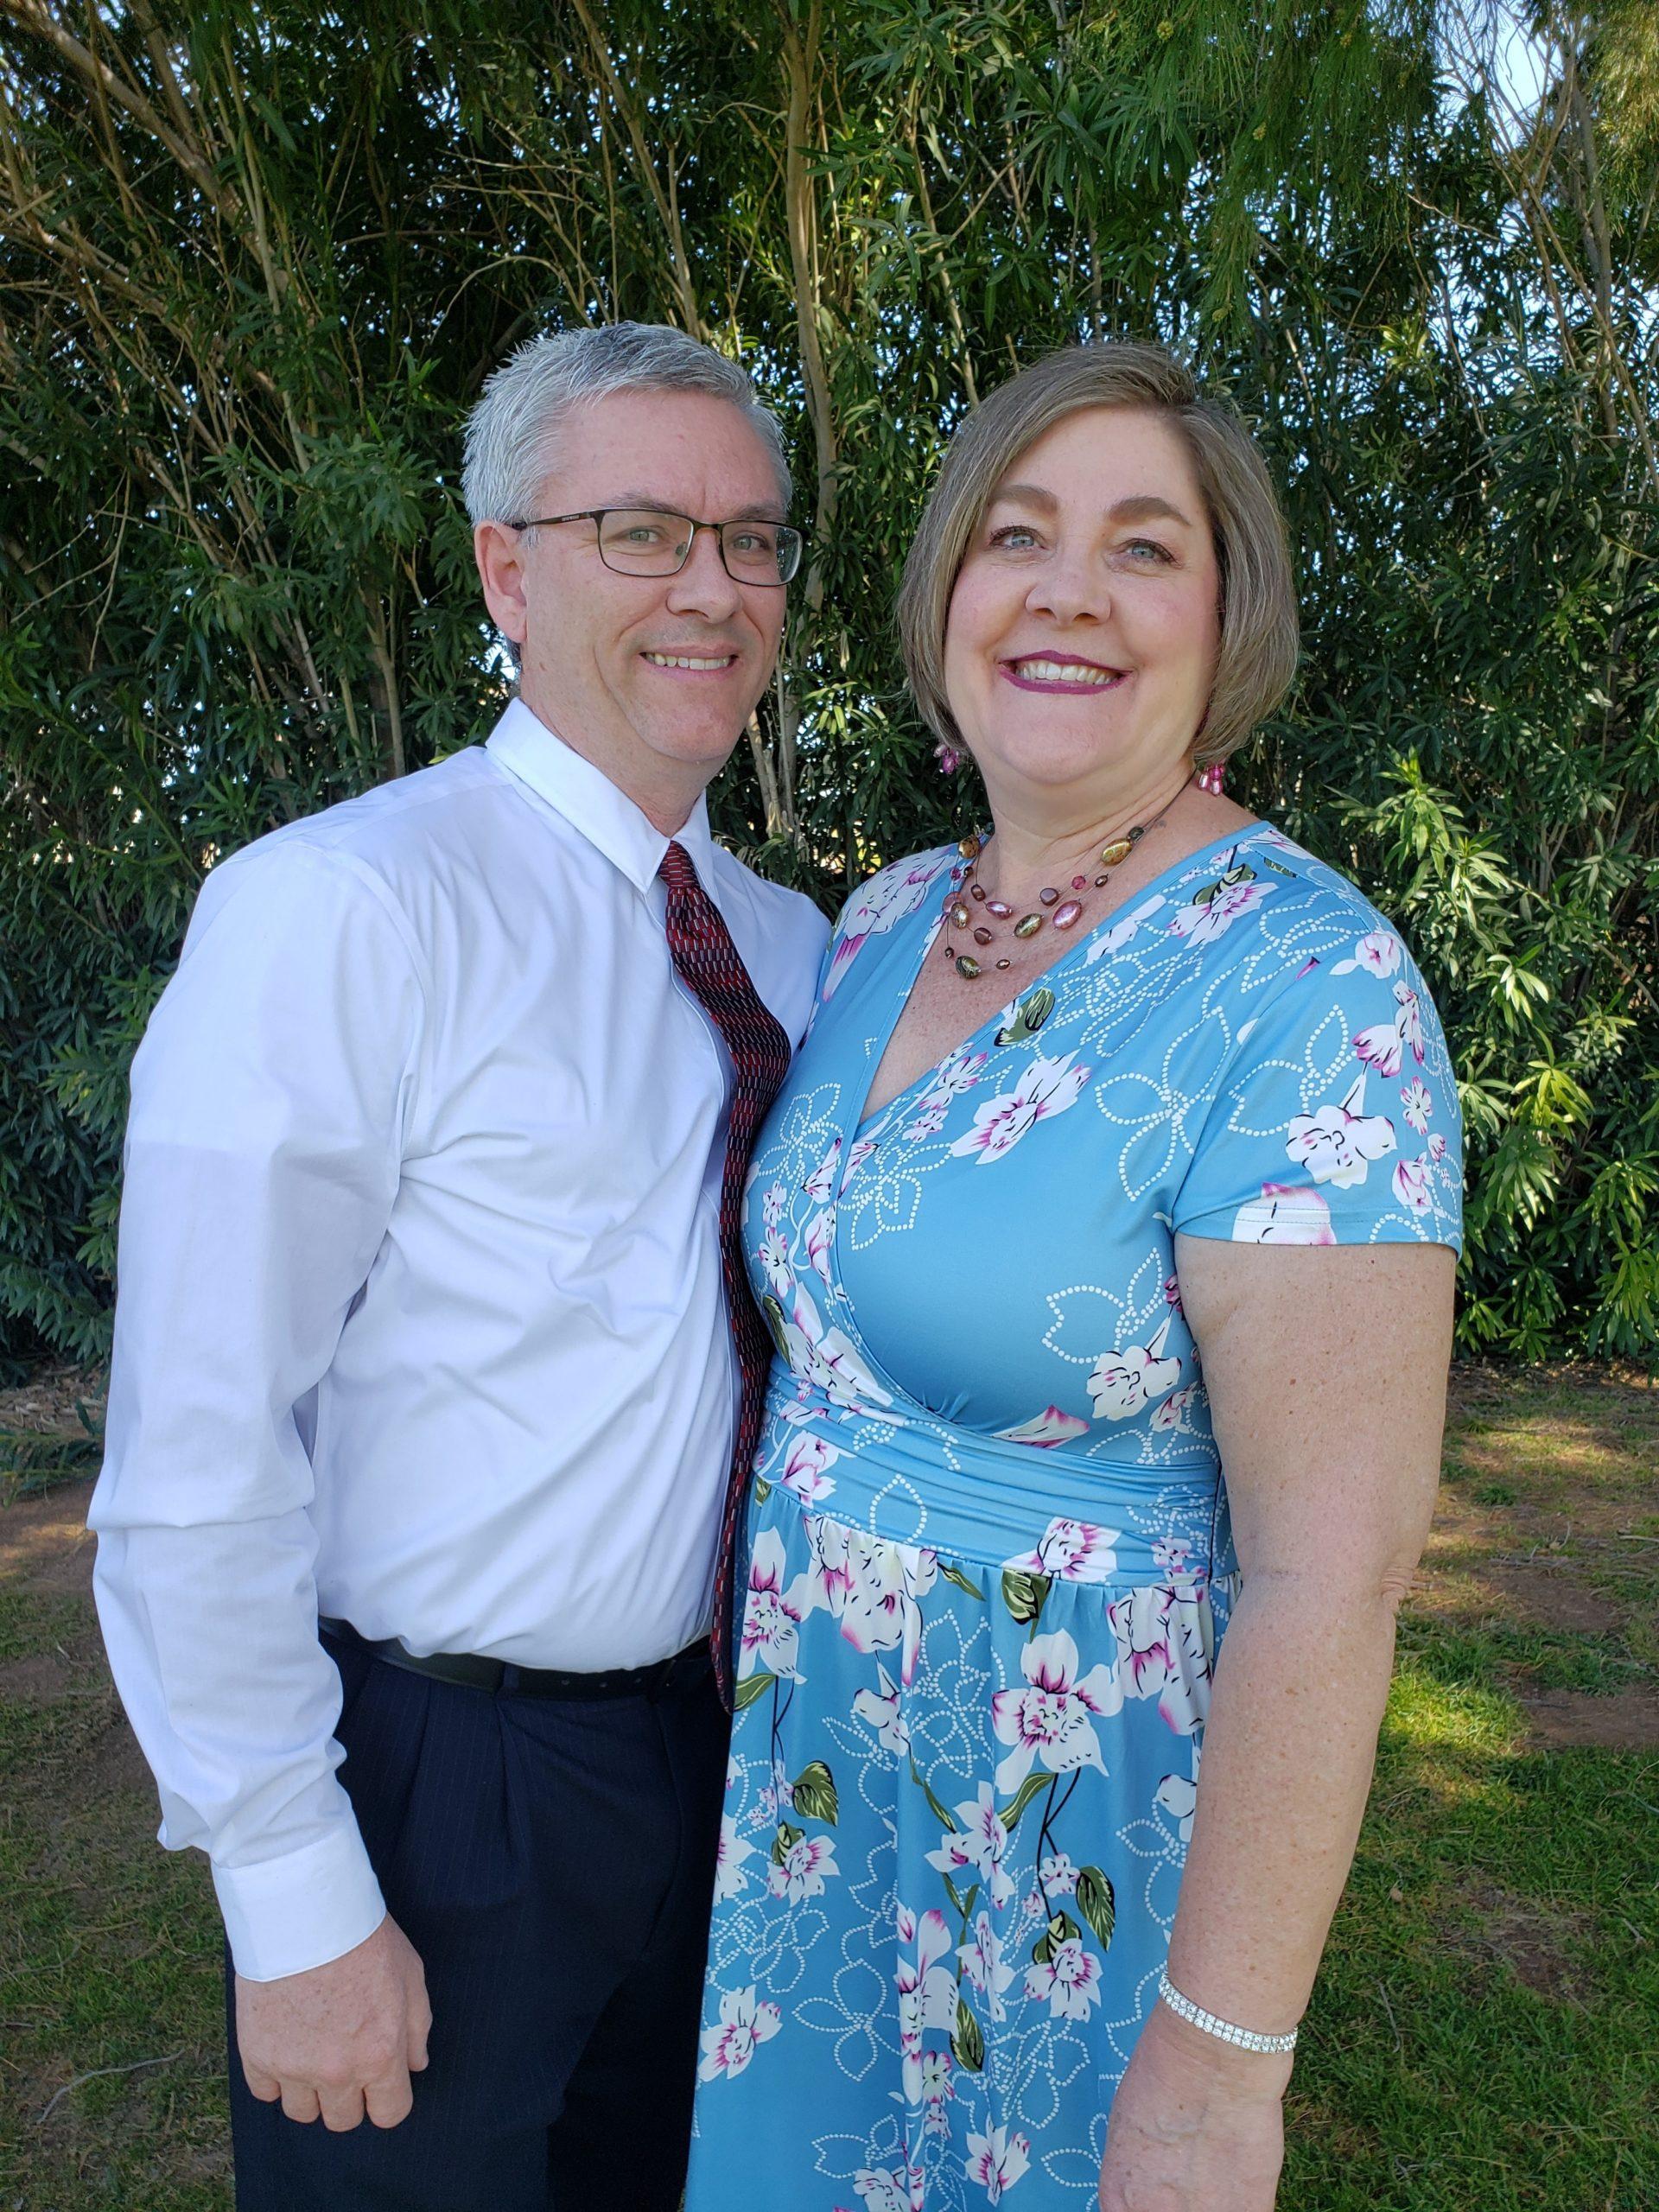 Randy and Janice Ryschon